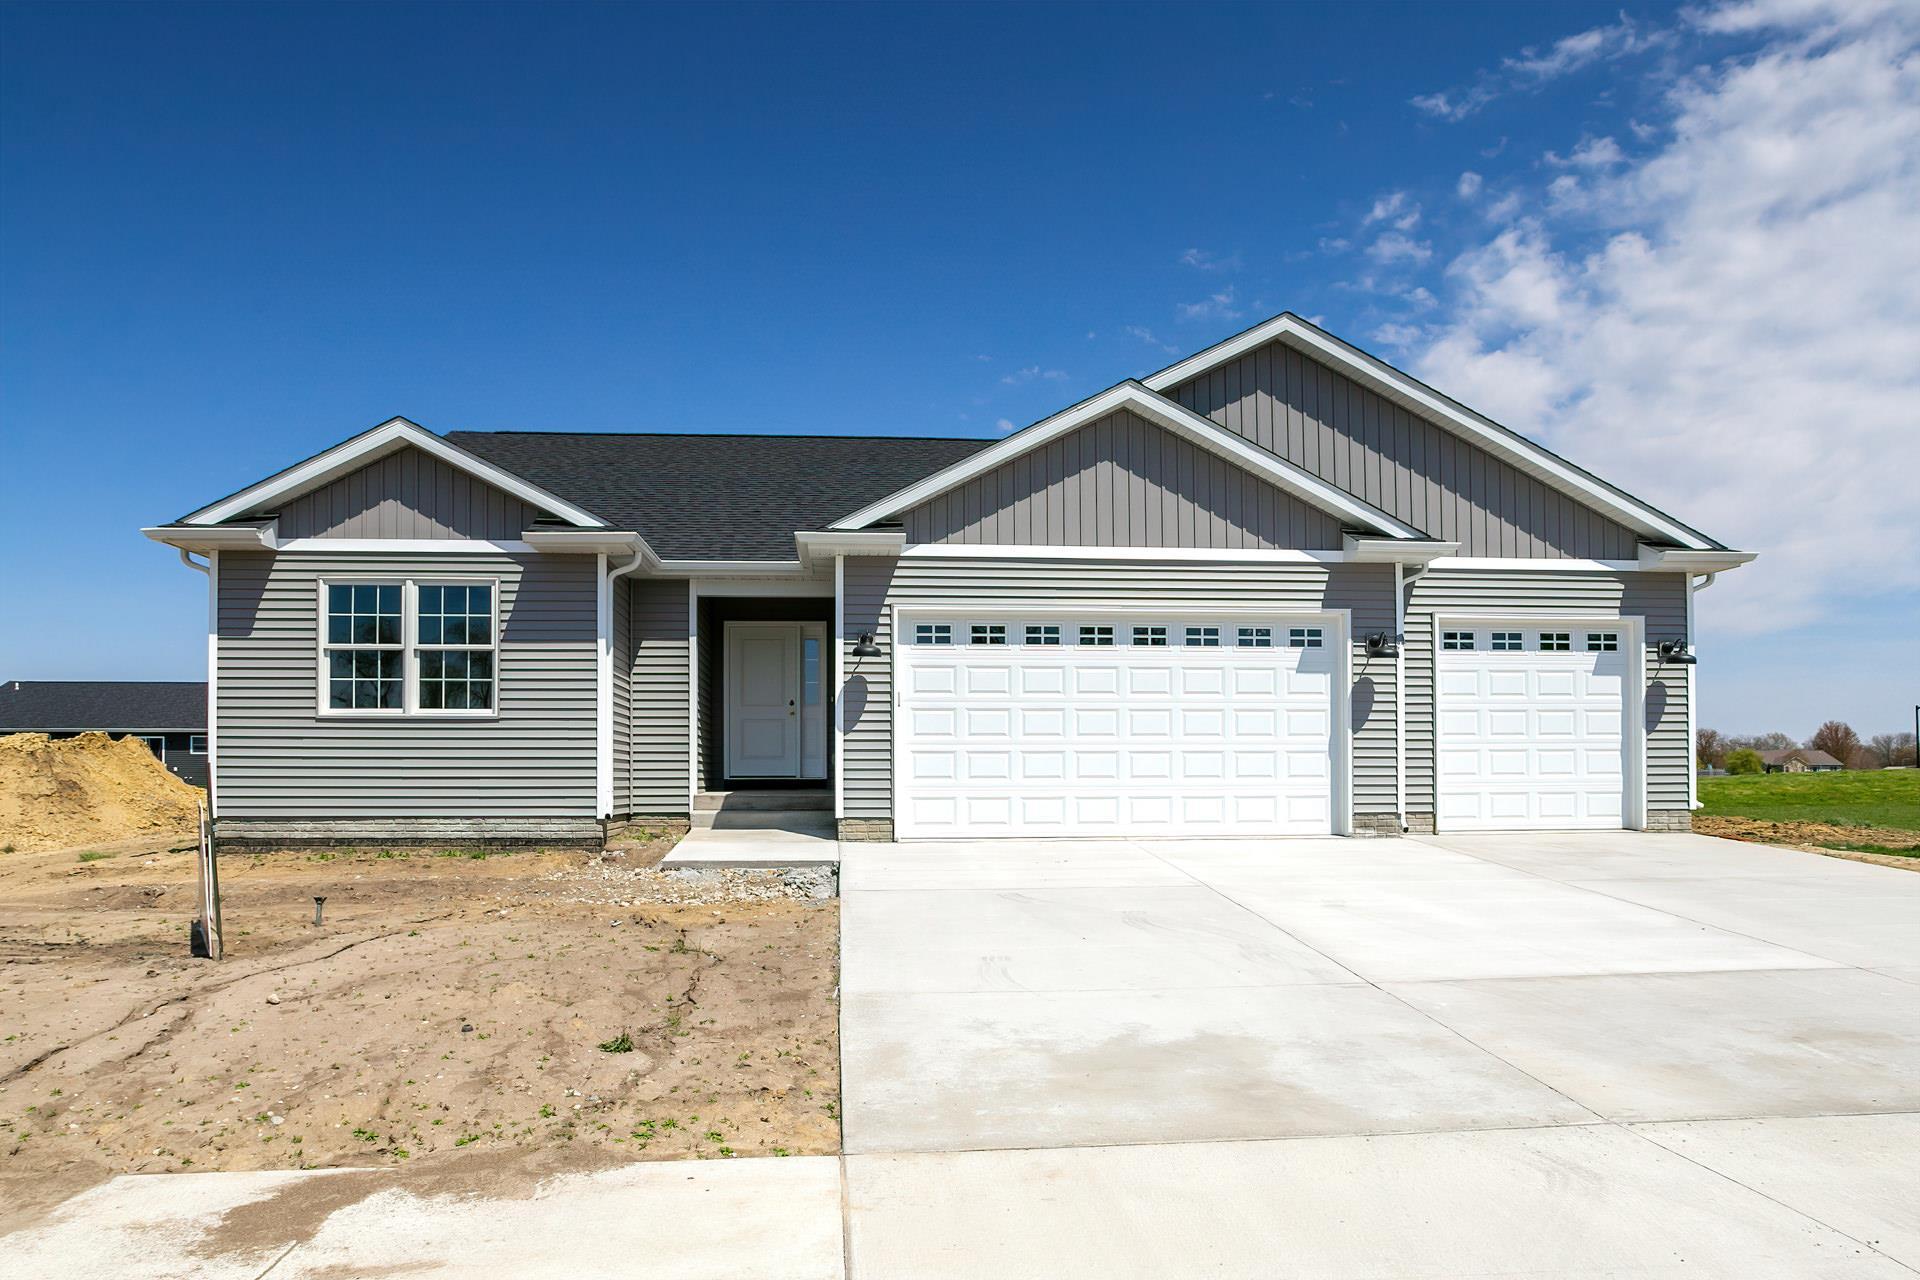 4704 W 11TH Property Photo - Davenport, IA real estate listing